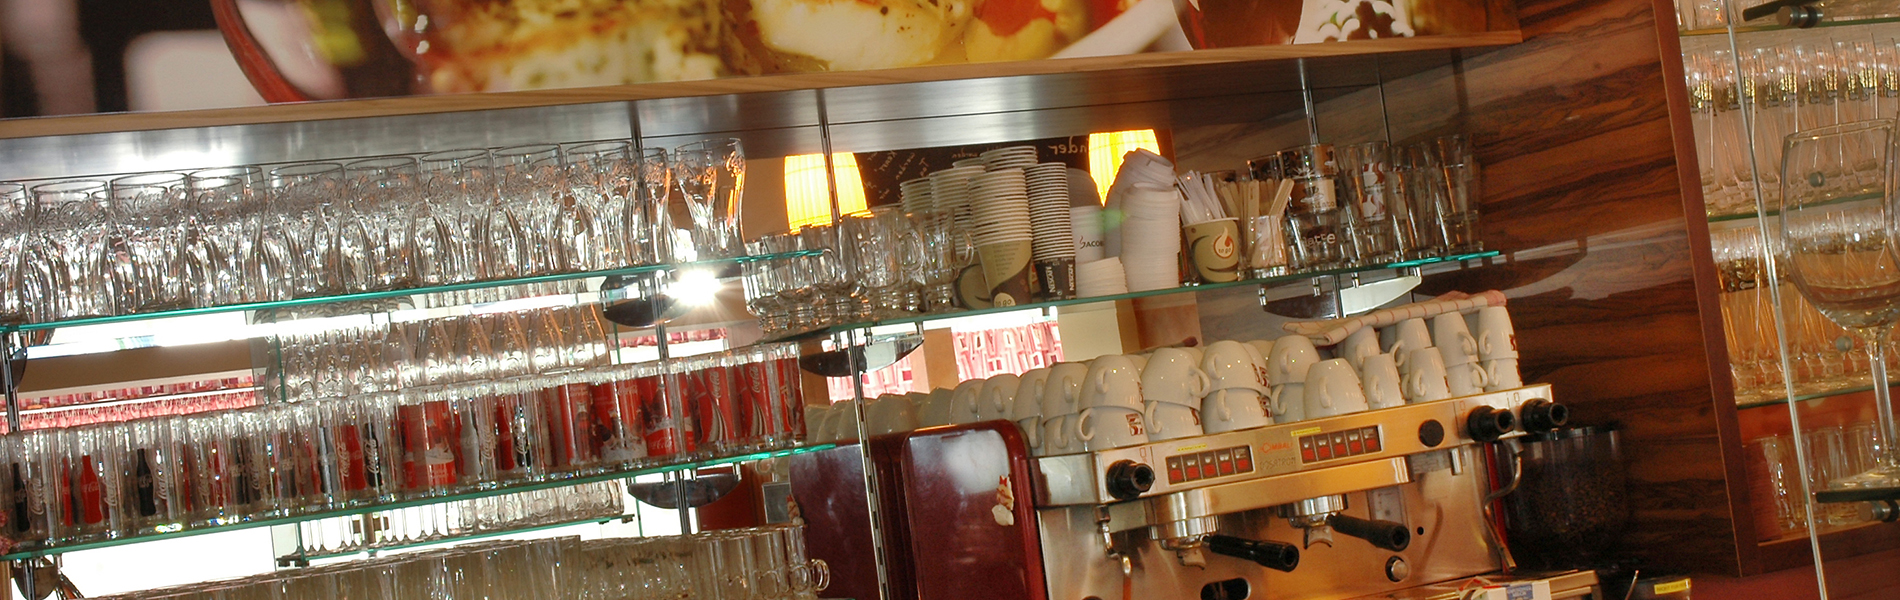 Café Seeblickterrasse